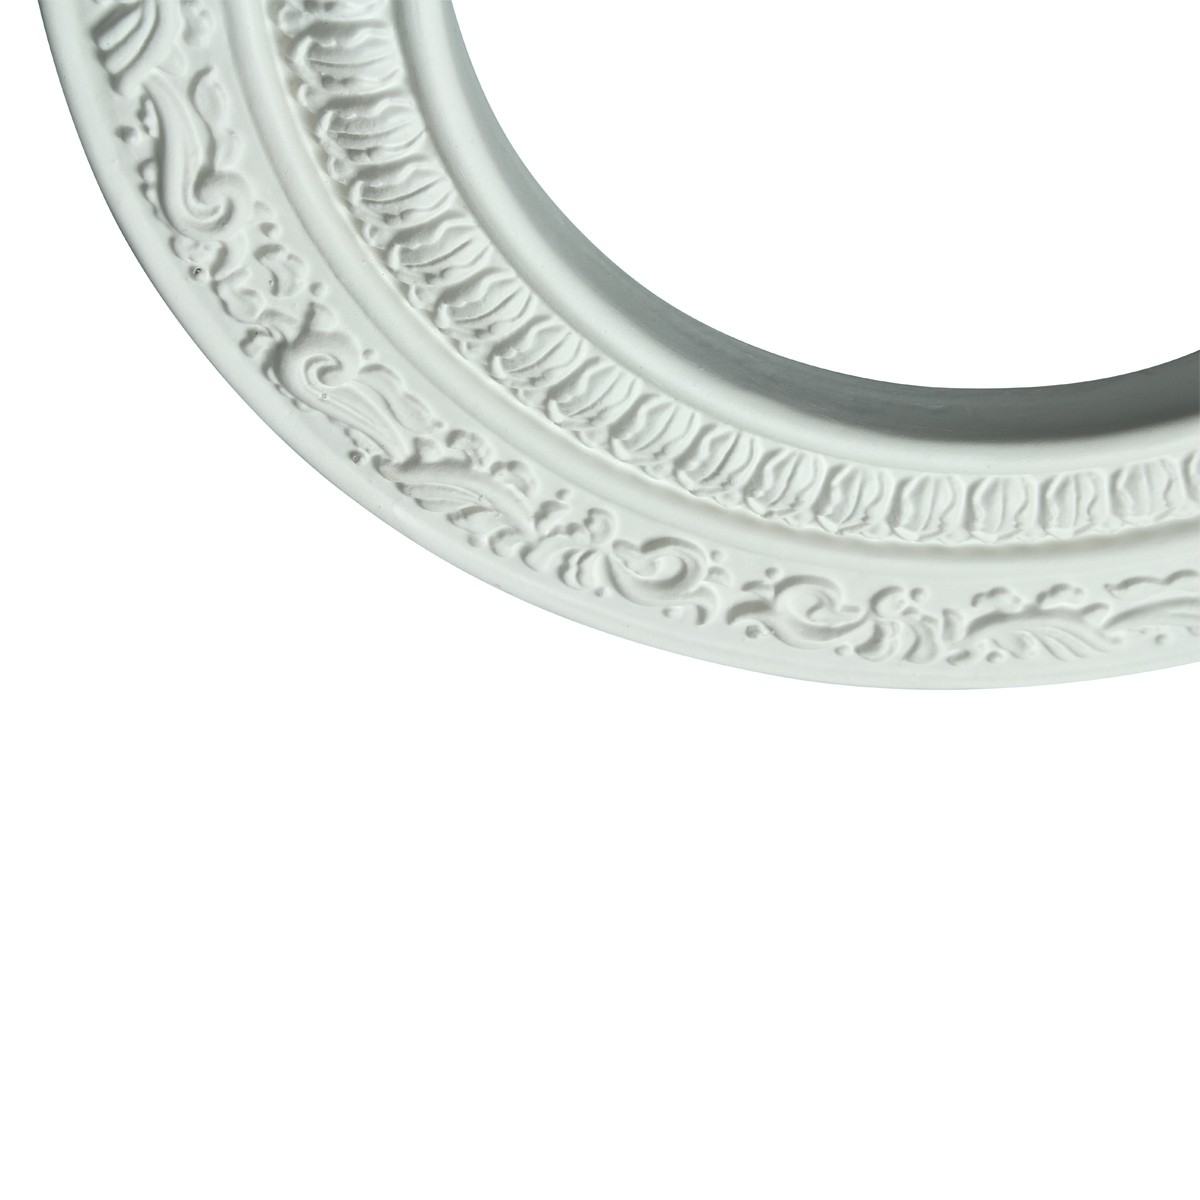 5 Spot Light Trim Medallions 6 ID White Urethane Set of 5 Light Medallion Light Medallions Lighting Medallion